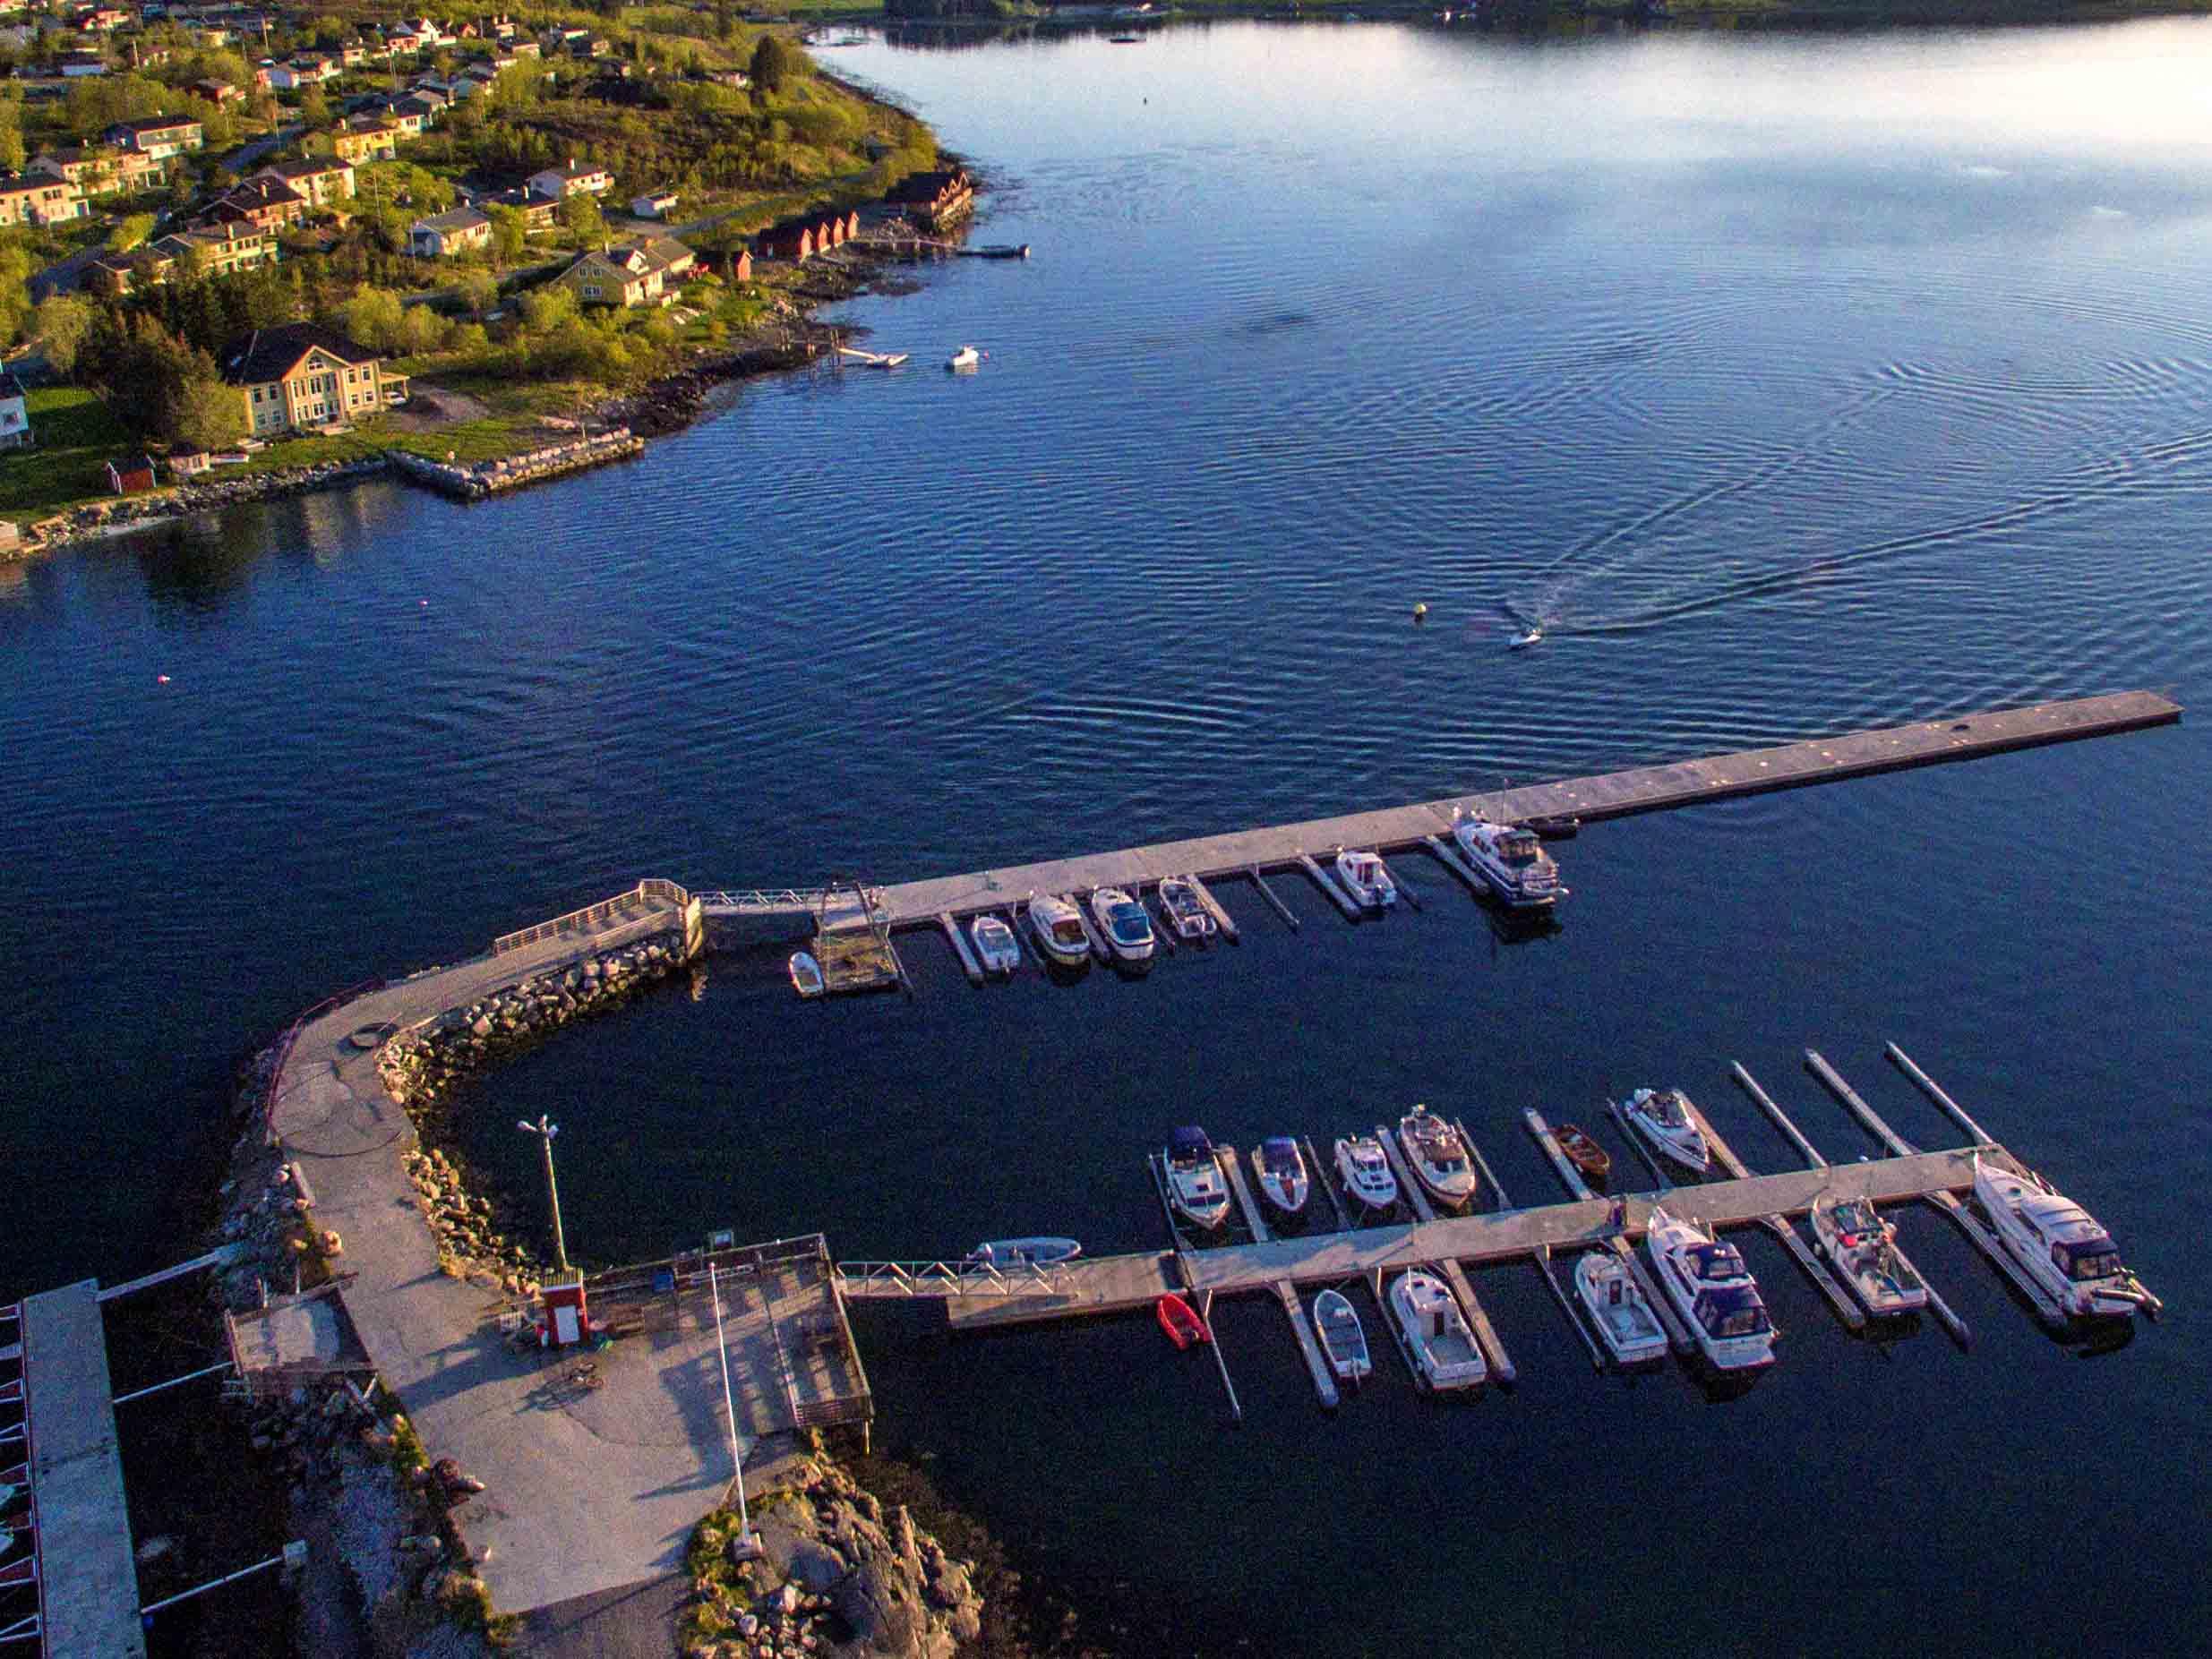 Helgelandsbrygge på vannet ved Berg marina i Sømna